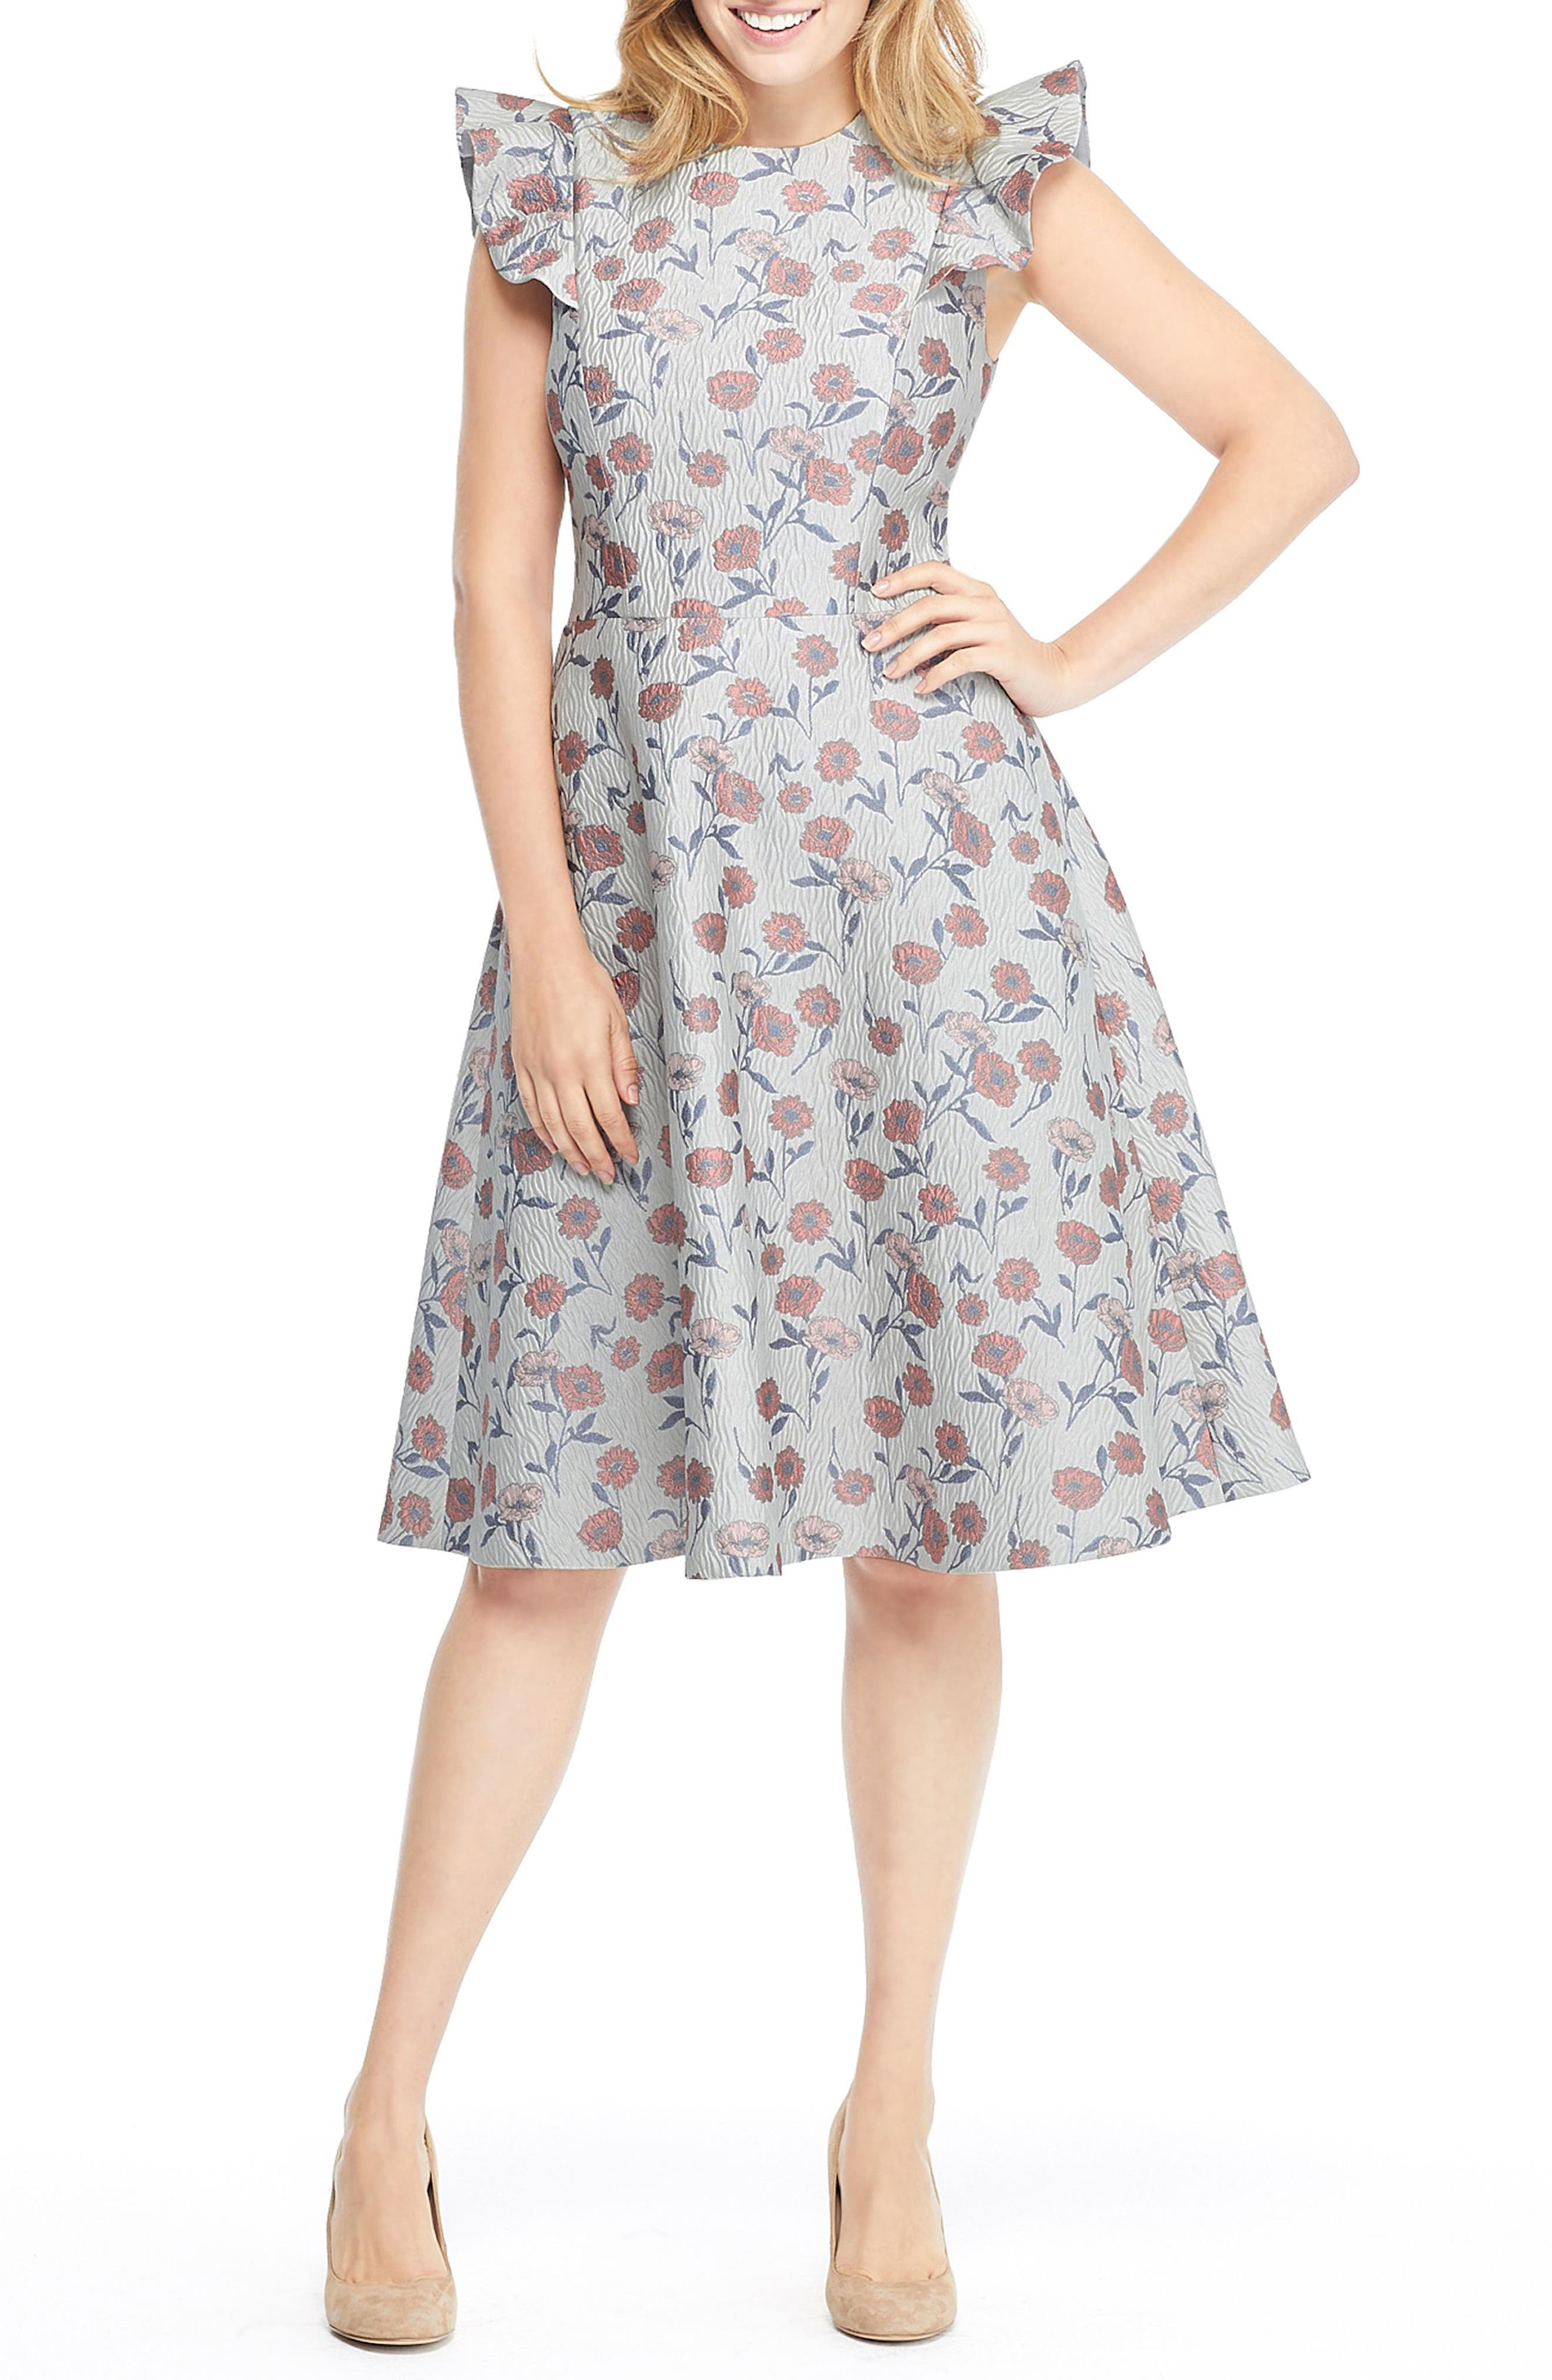 GAL MEETS GLAM COLLECTION, Lola Dancing Daisy Jacquard Dress, Main thumbnail 1, color, 650